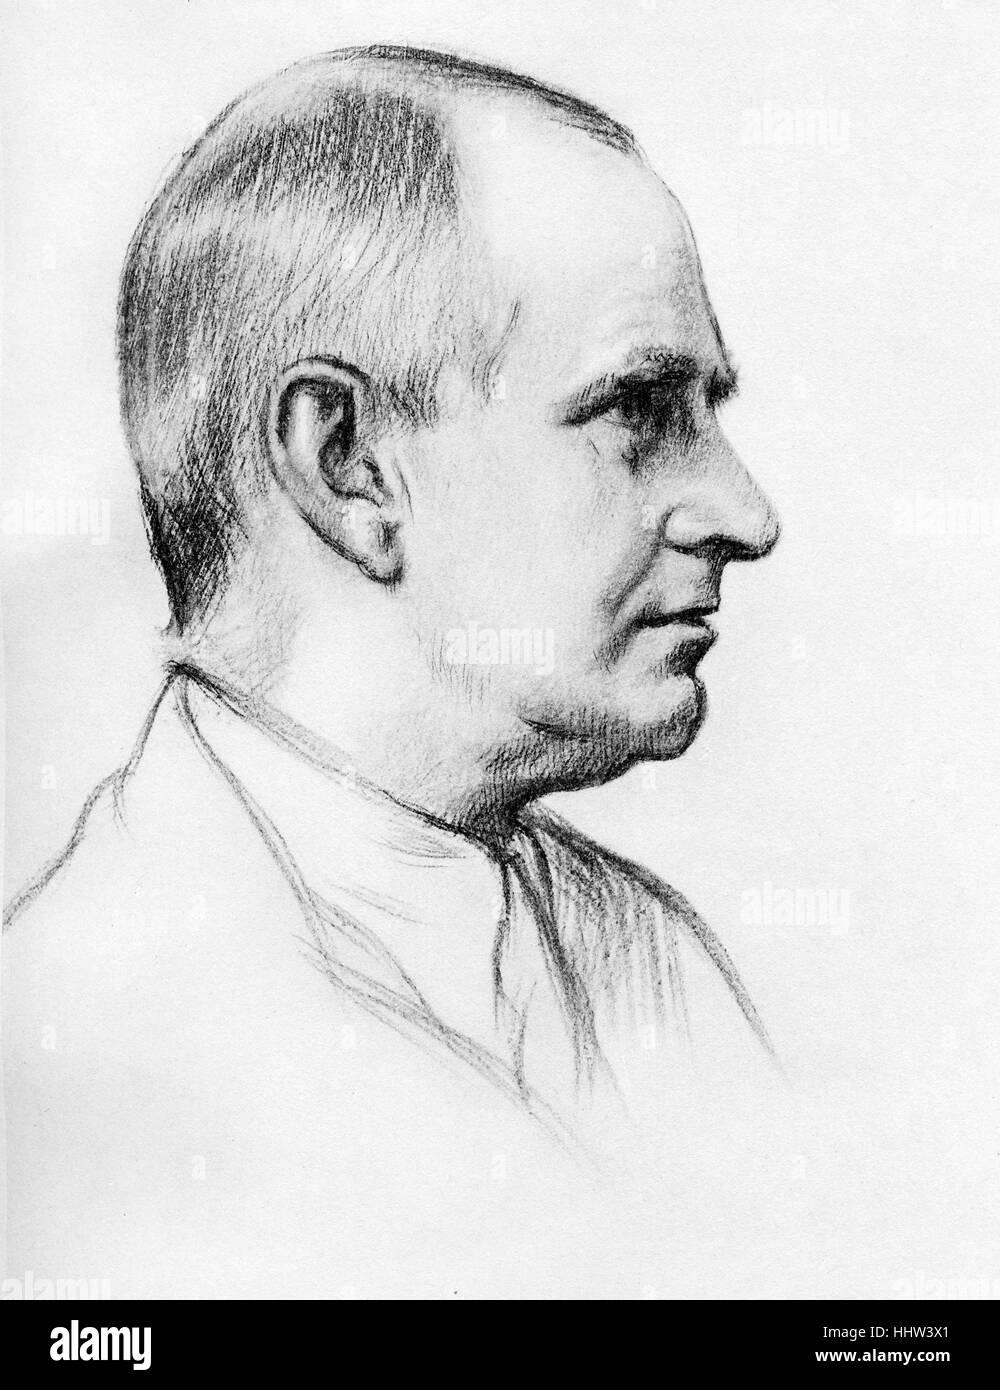 Sir Arthur Stanley Eddington, (28 December 1882 – 22 November 1944  English astrophysicist.  After a drawing by - Stock Image